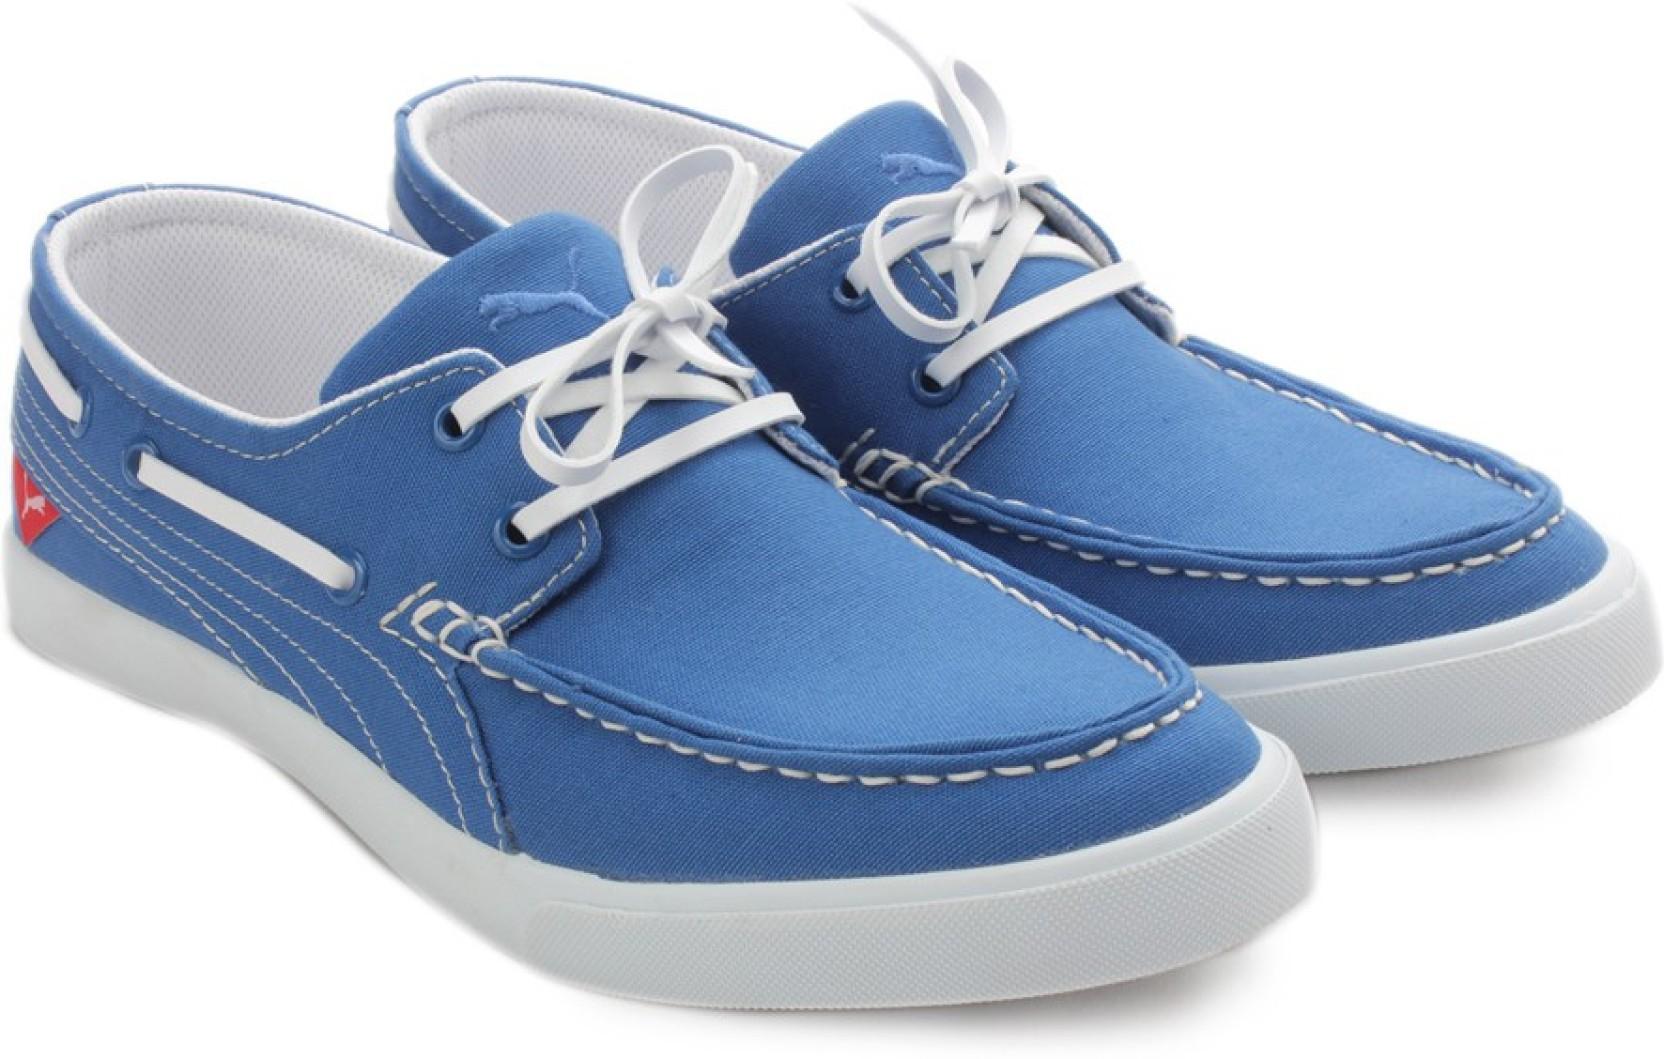 Puma Yacht CVS IDP Boat Shoes For Men - Buy Imperial Purple Color ...